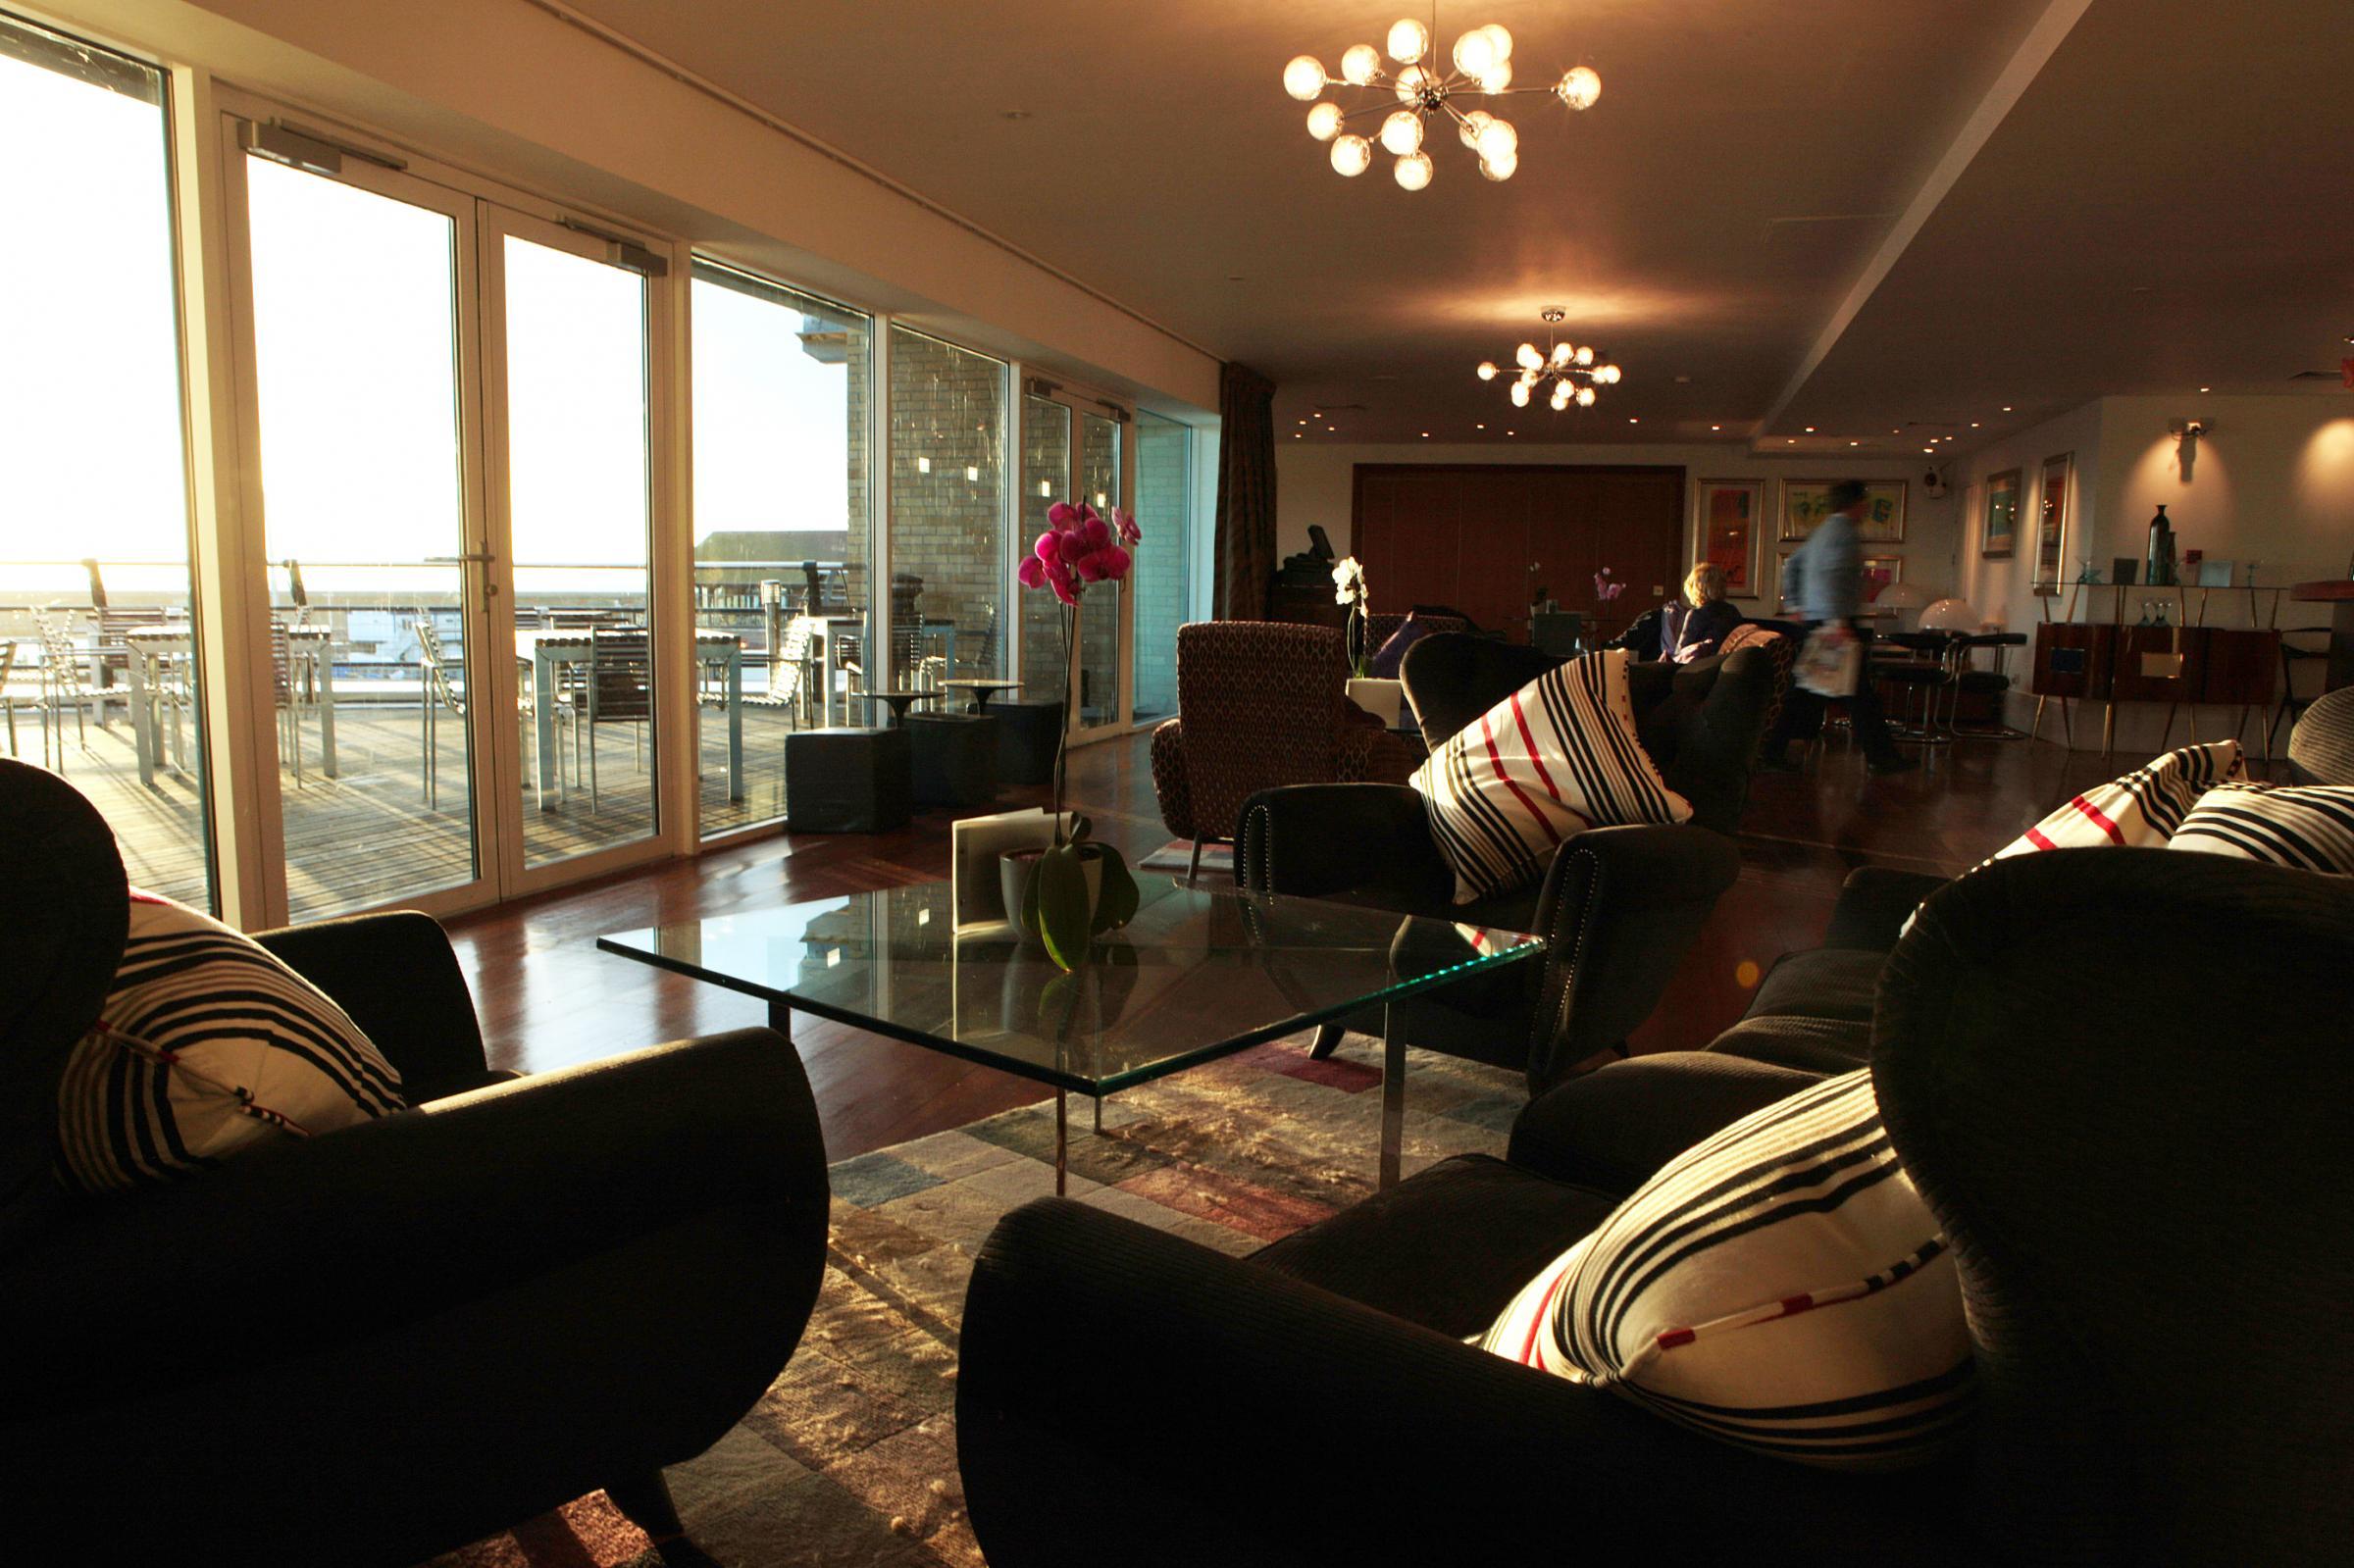 Hotel du vin brighton deals